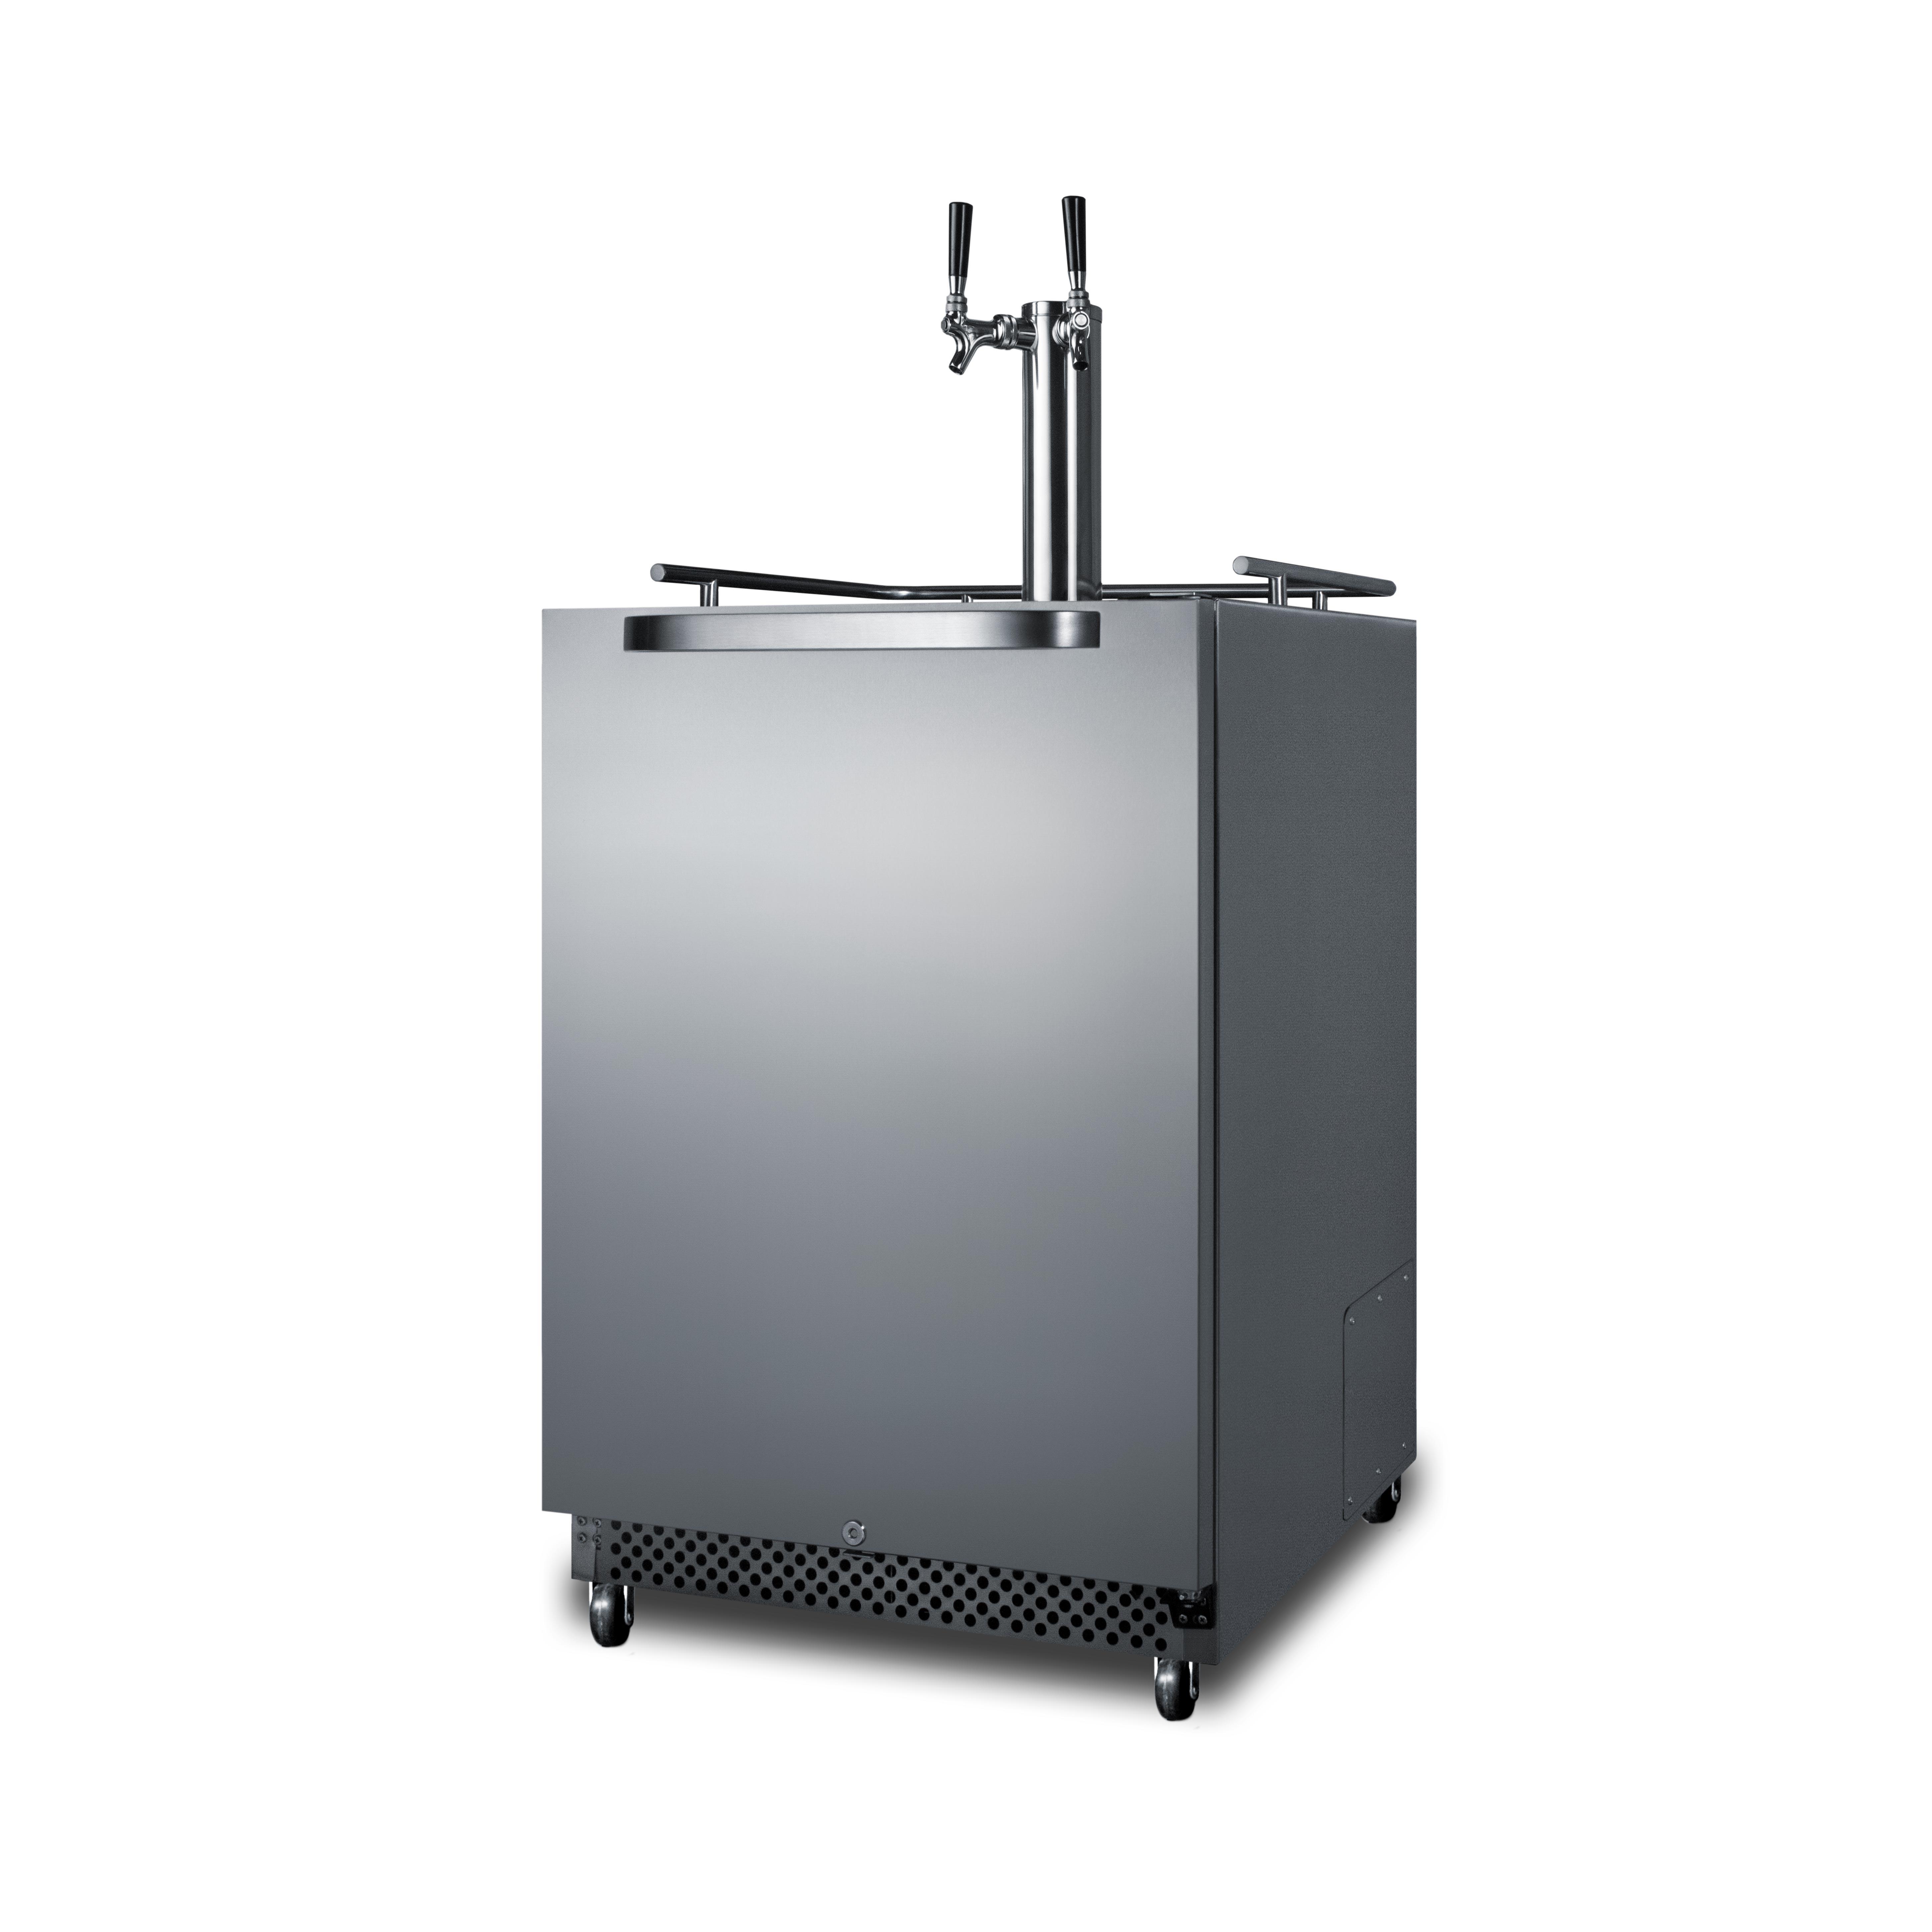 Summit Appliance SBC695OSTWIN draft beer cooler